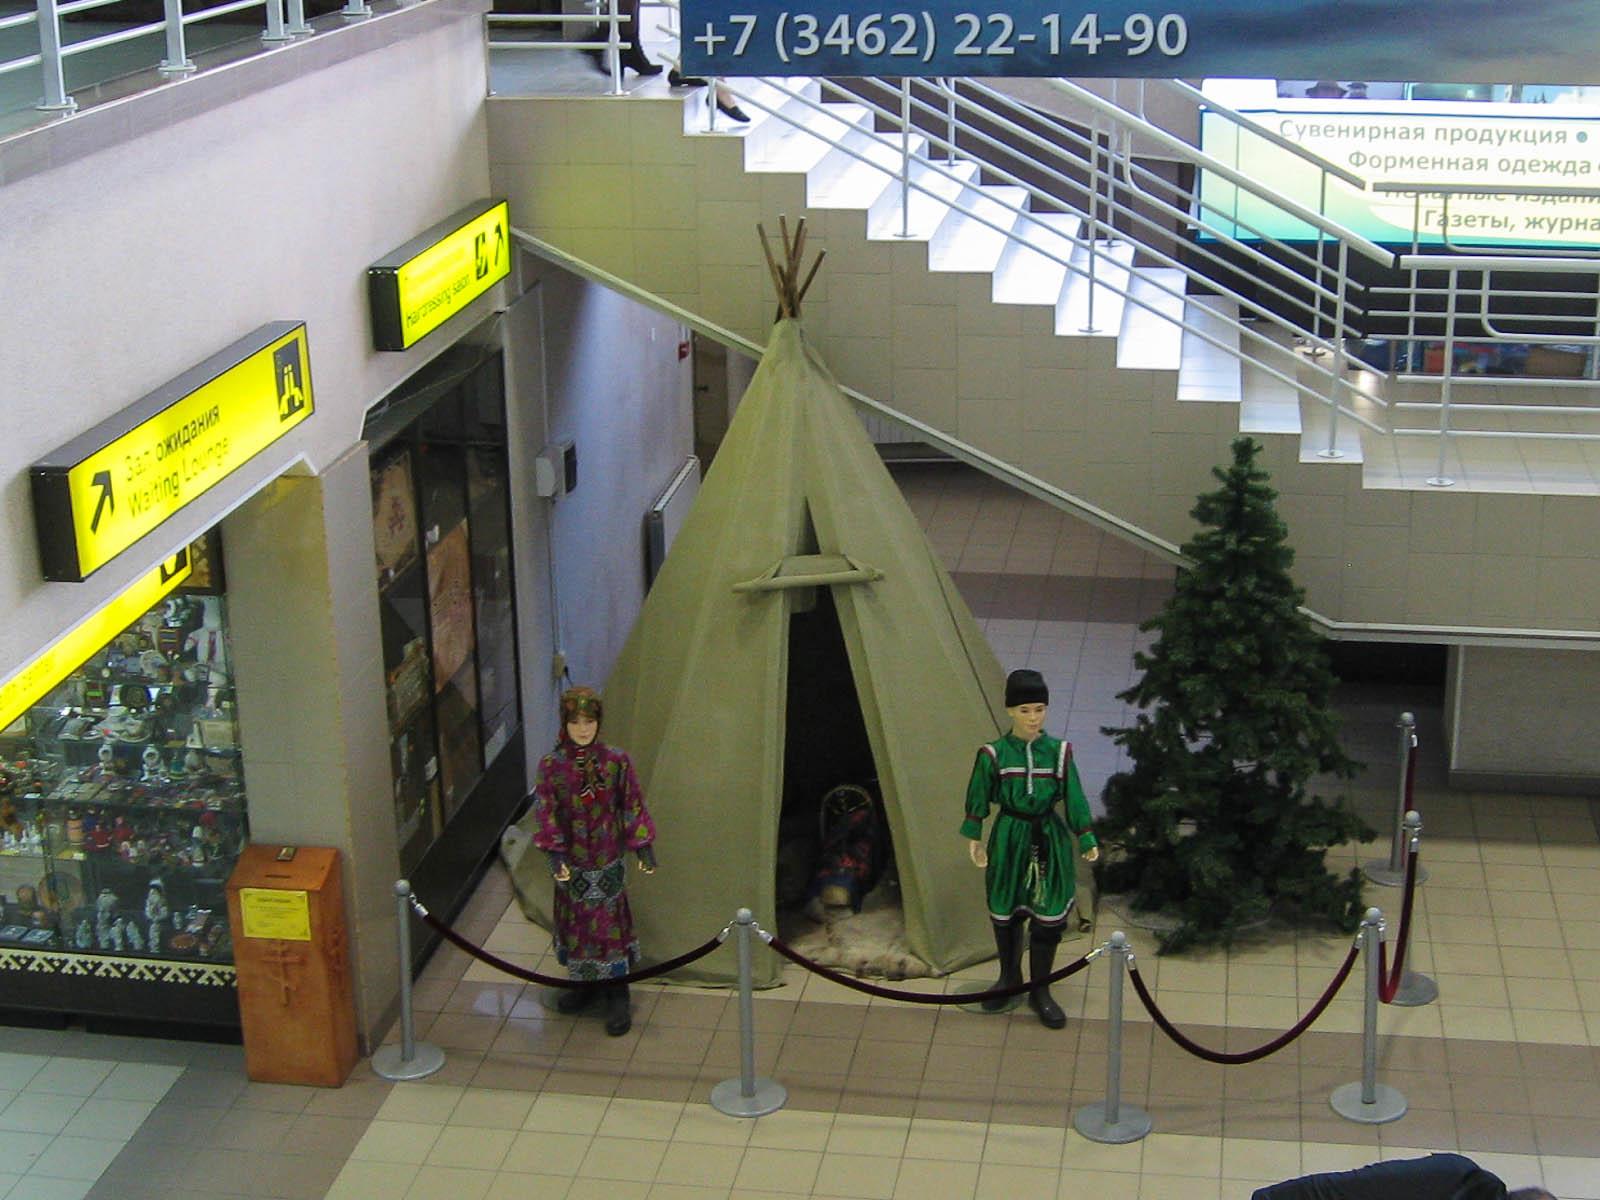 Юрта в аэропорту Сургут